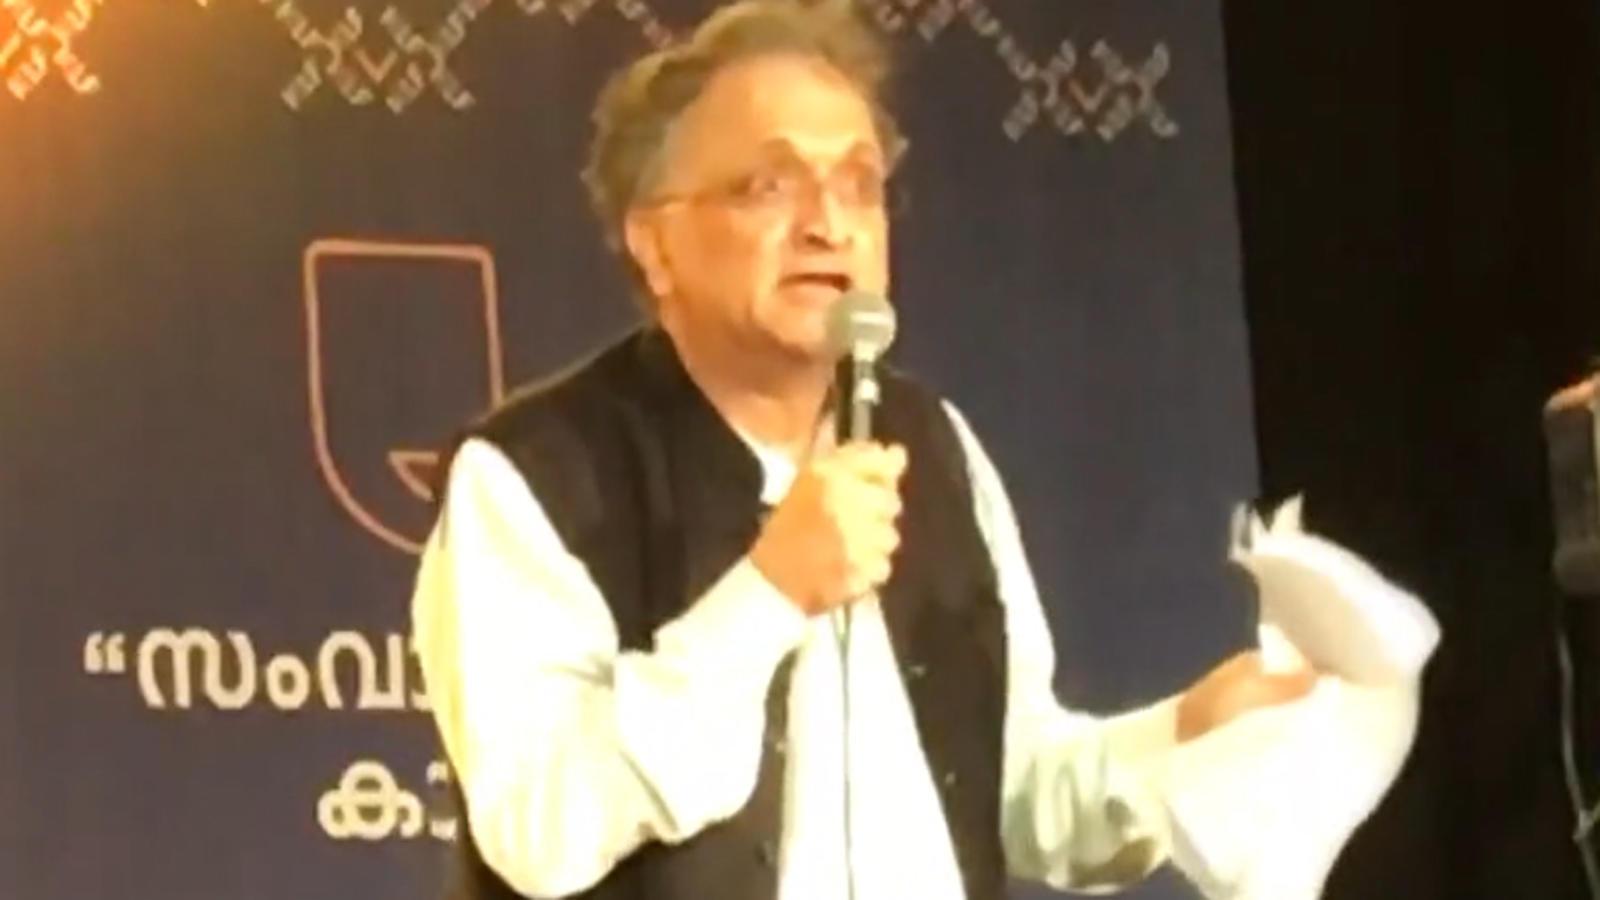 young-india-does-not-want-fifth-generation-dynast-historian-ramachandra-guha-on-rahul-gandhi